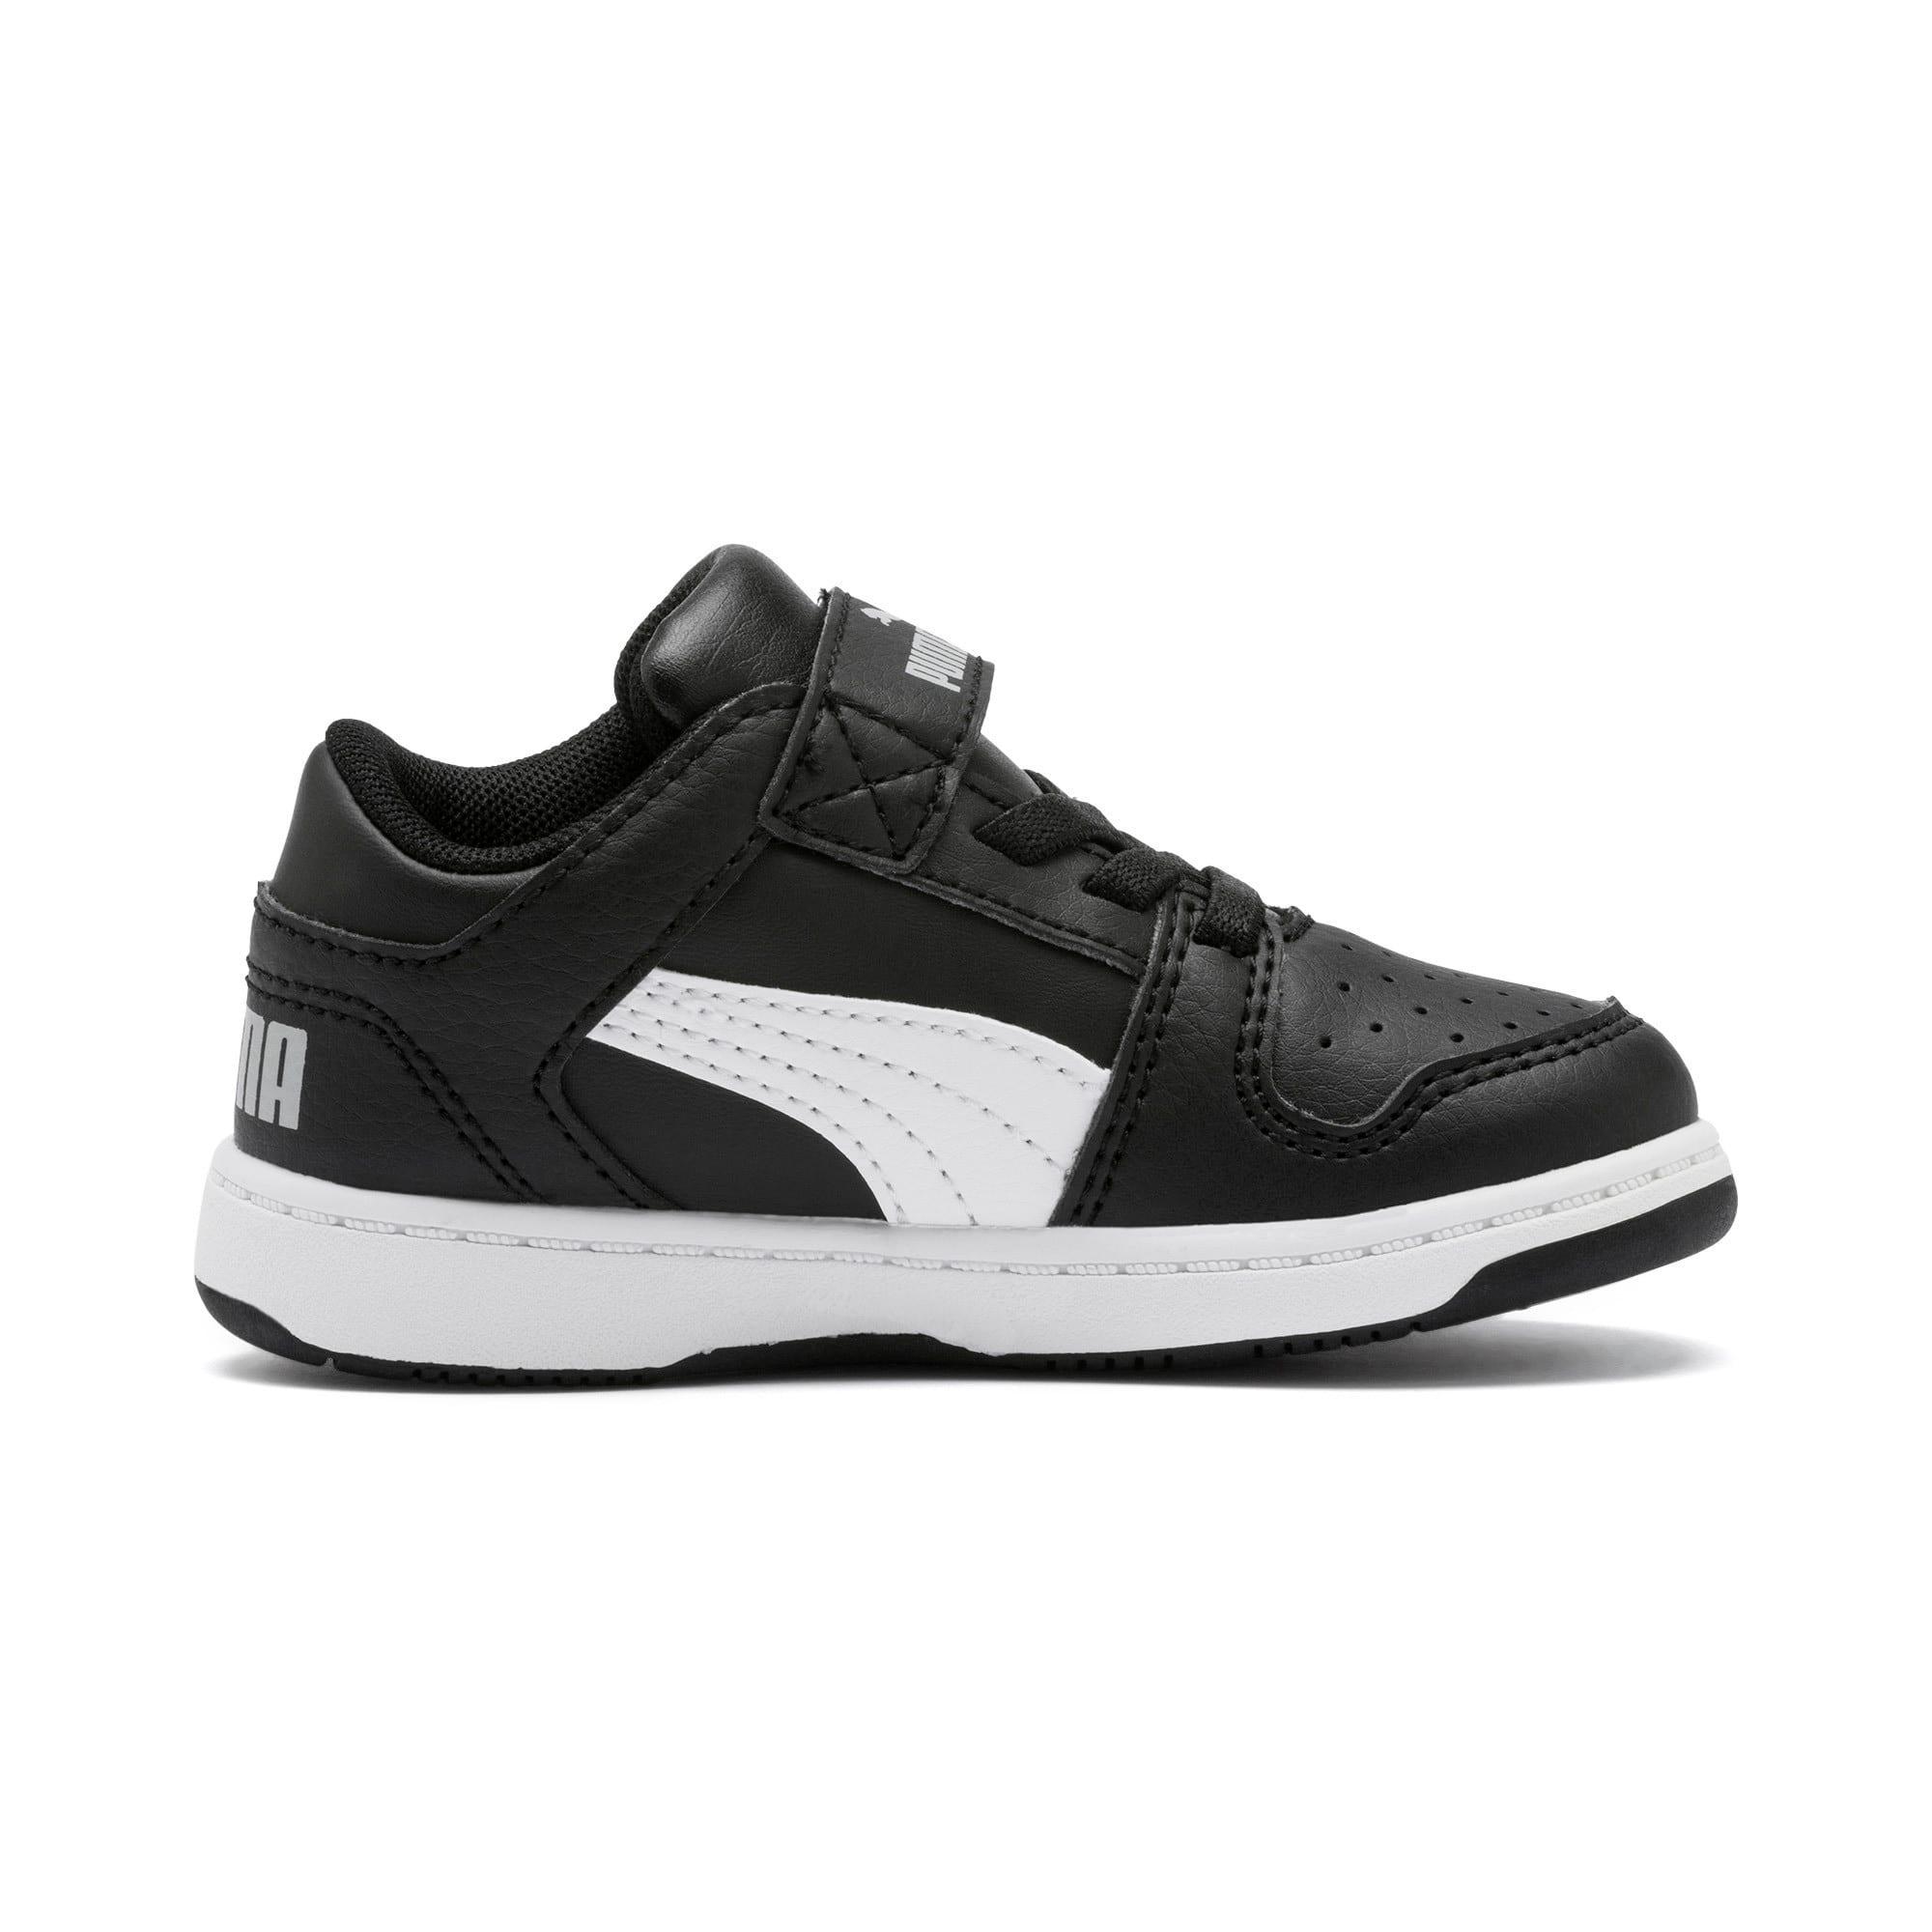 Miniatura 5 de Zapatos deportivos PUMA Rebound LayUp Lo para INF, Puma Black-Blanco-High Rise, mediano